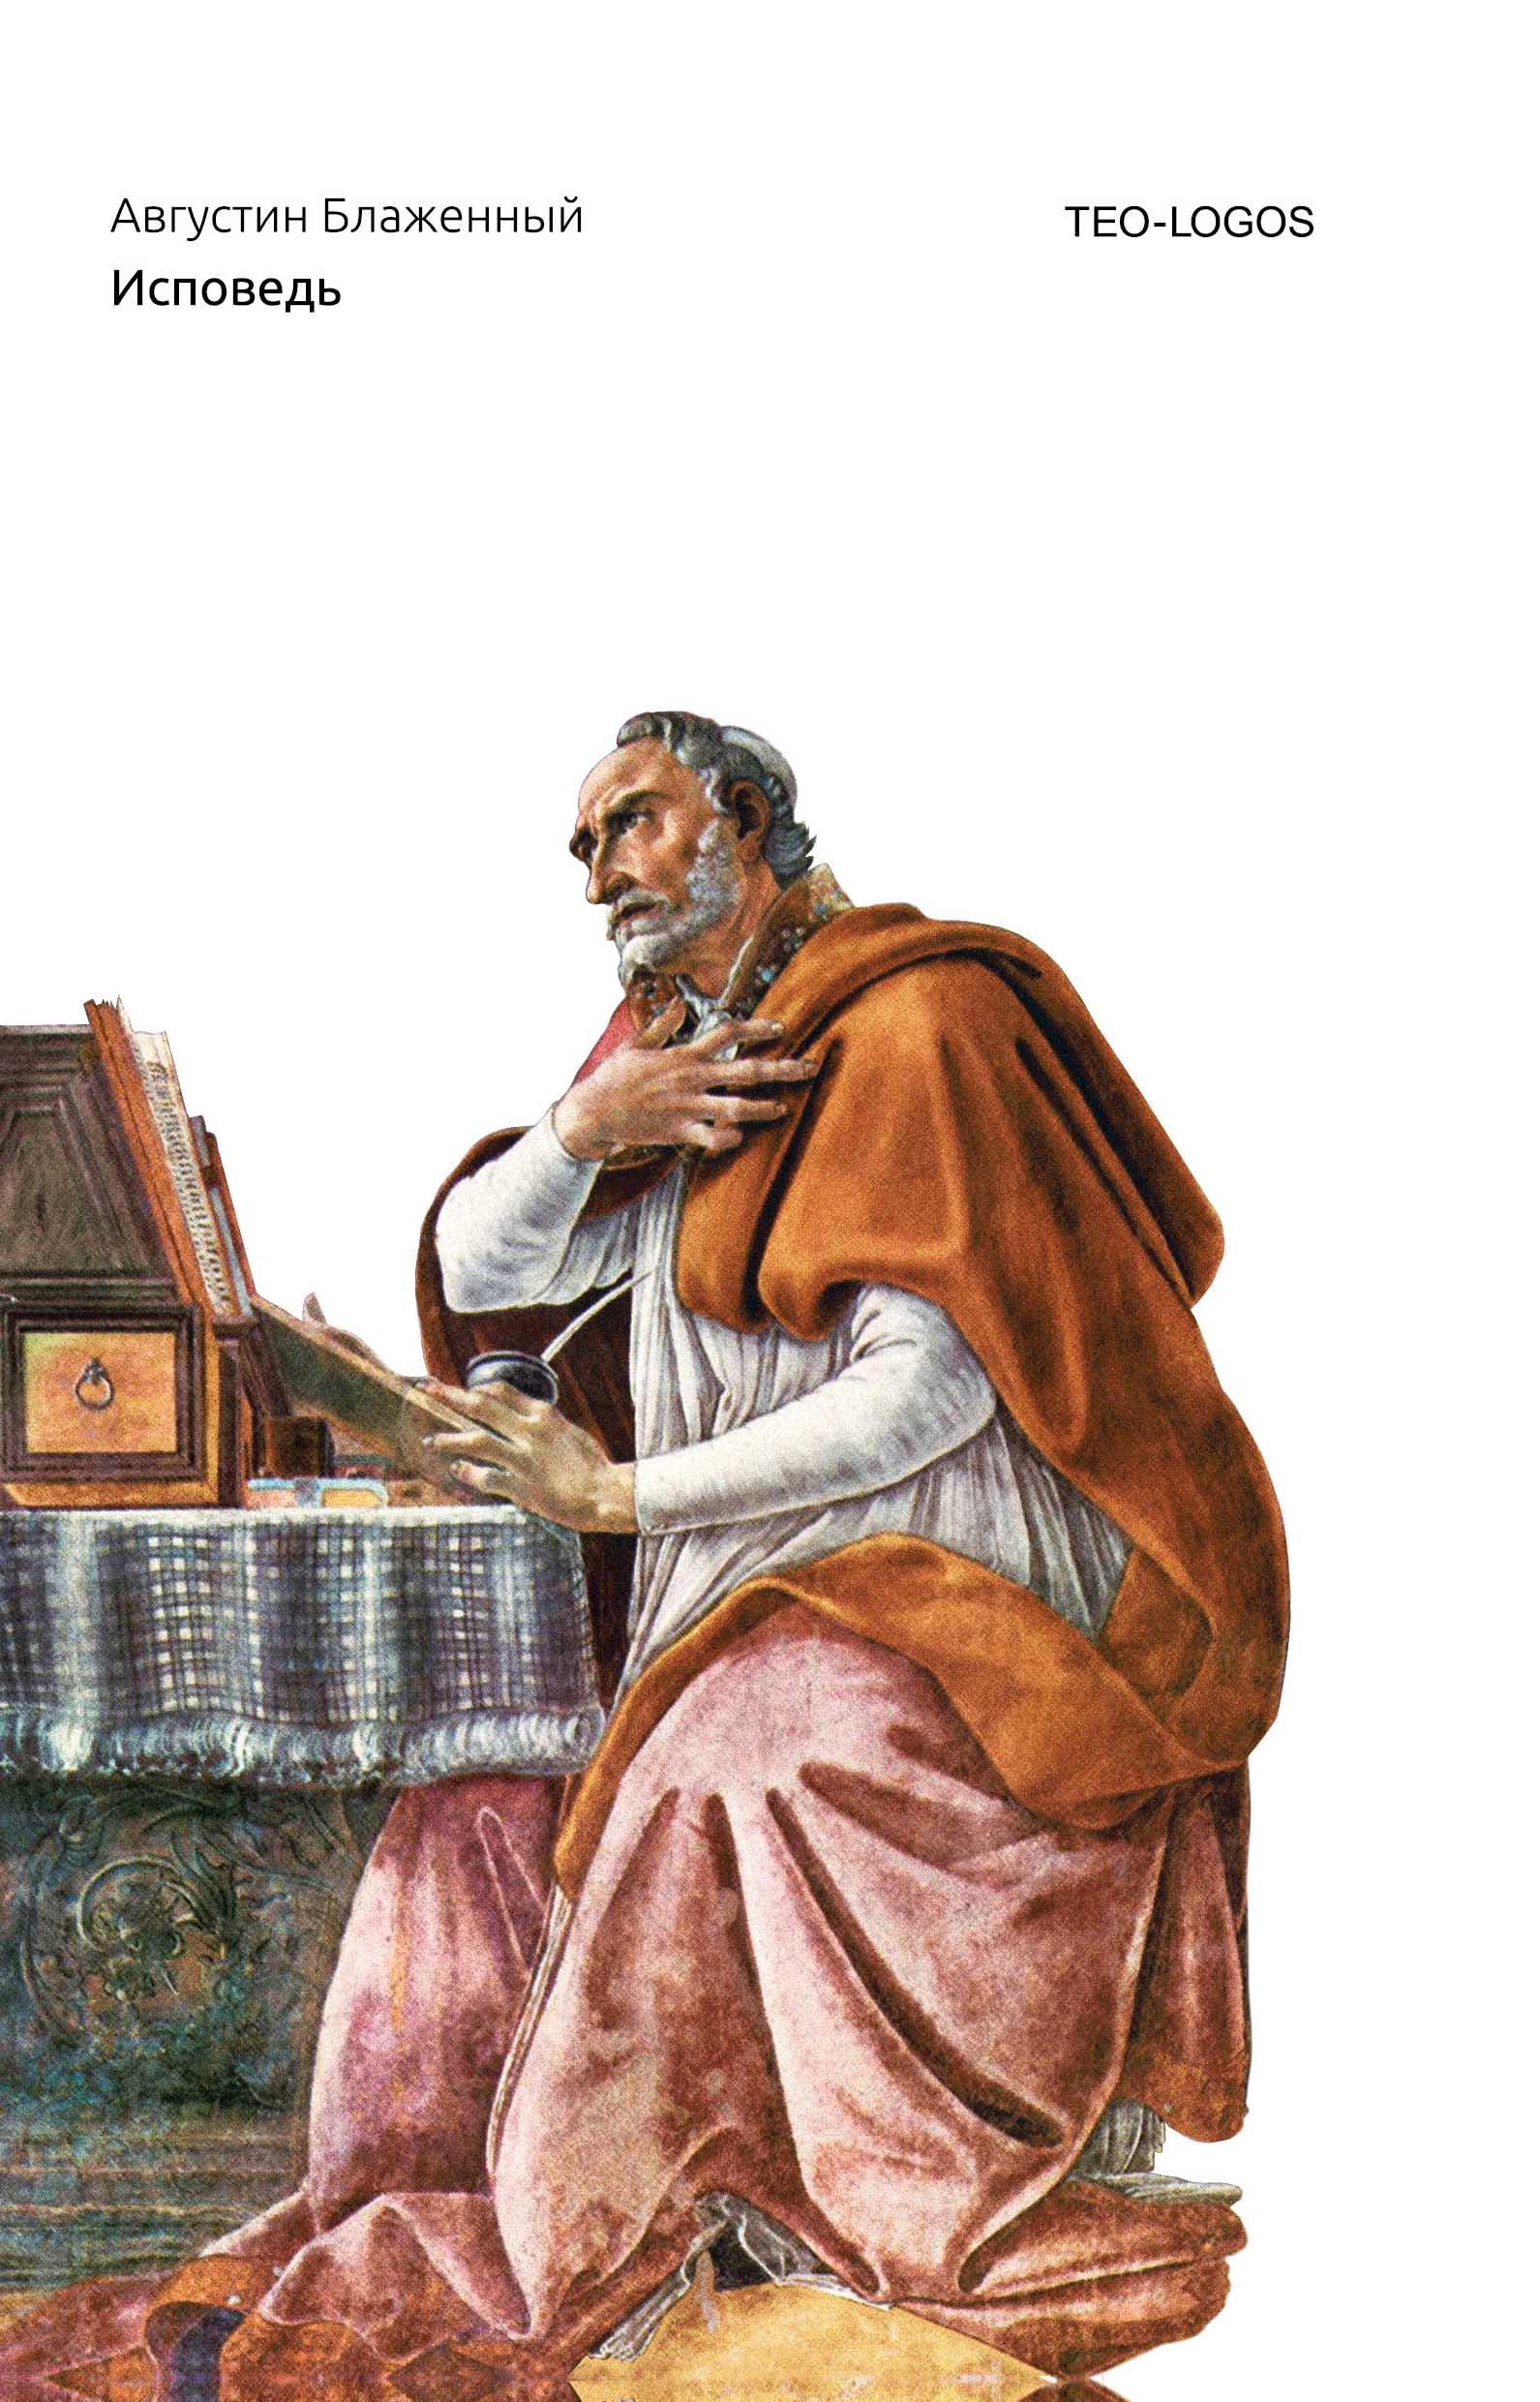 Августин Блаженный Исповедь